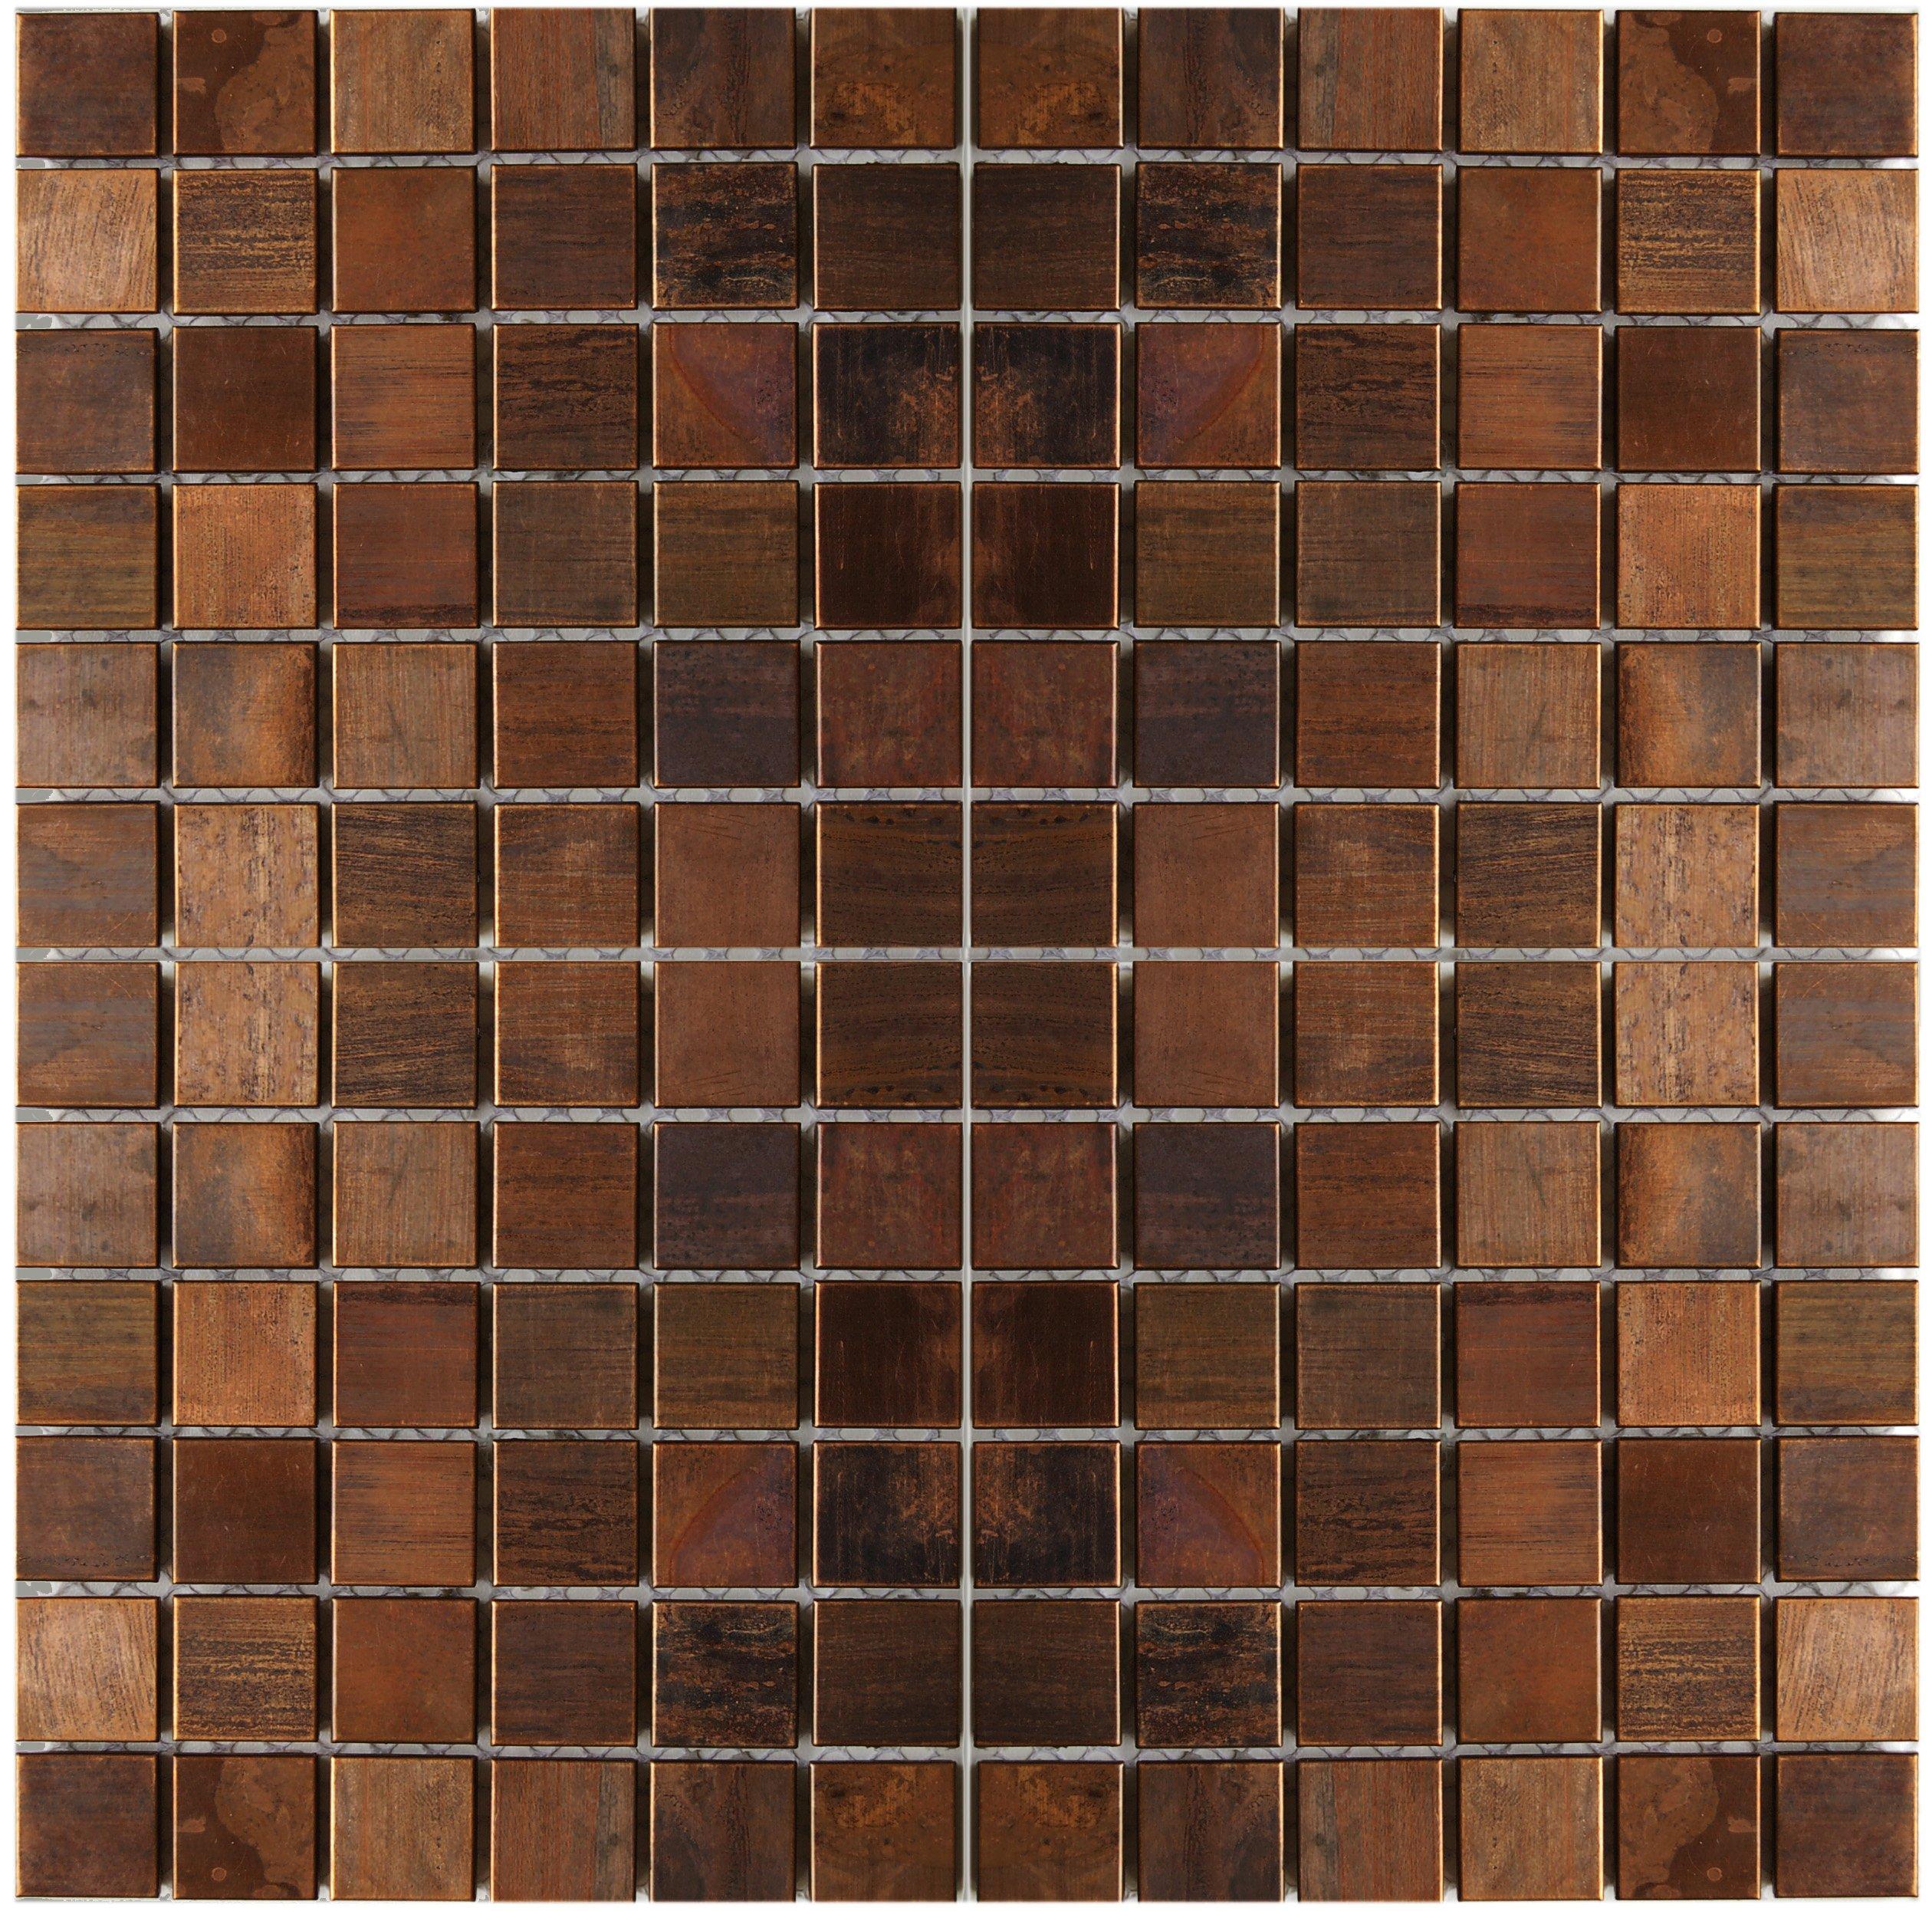 Medium Square Antique Copper Mosaic Tile - Kitchen Backsplash/Bath Backsplash/Wall Decor/Fireplace Surround by Eden Mosaic Tile